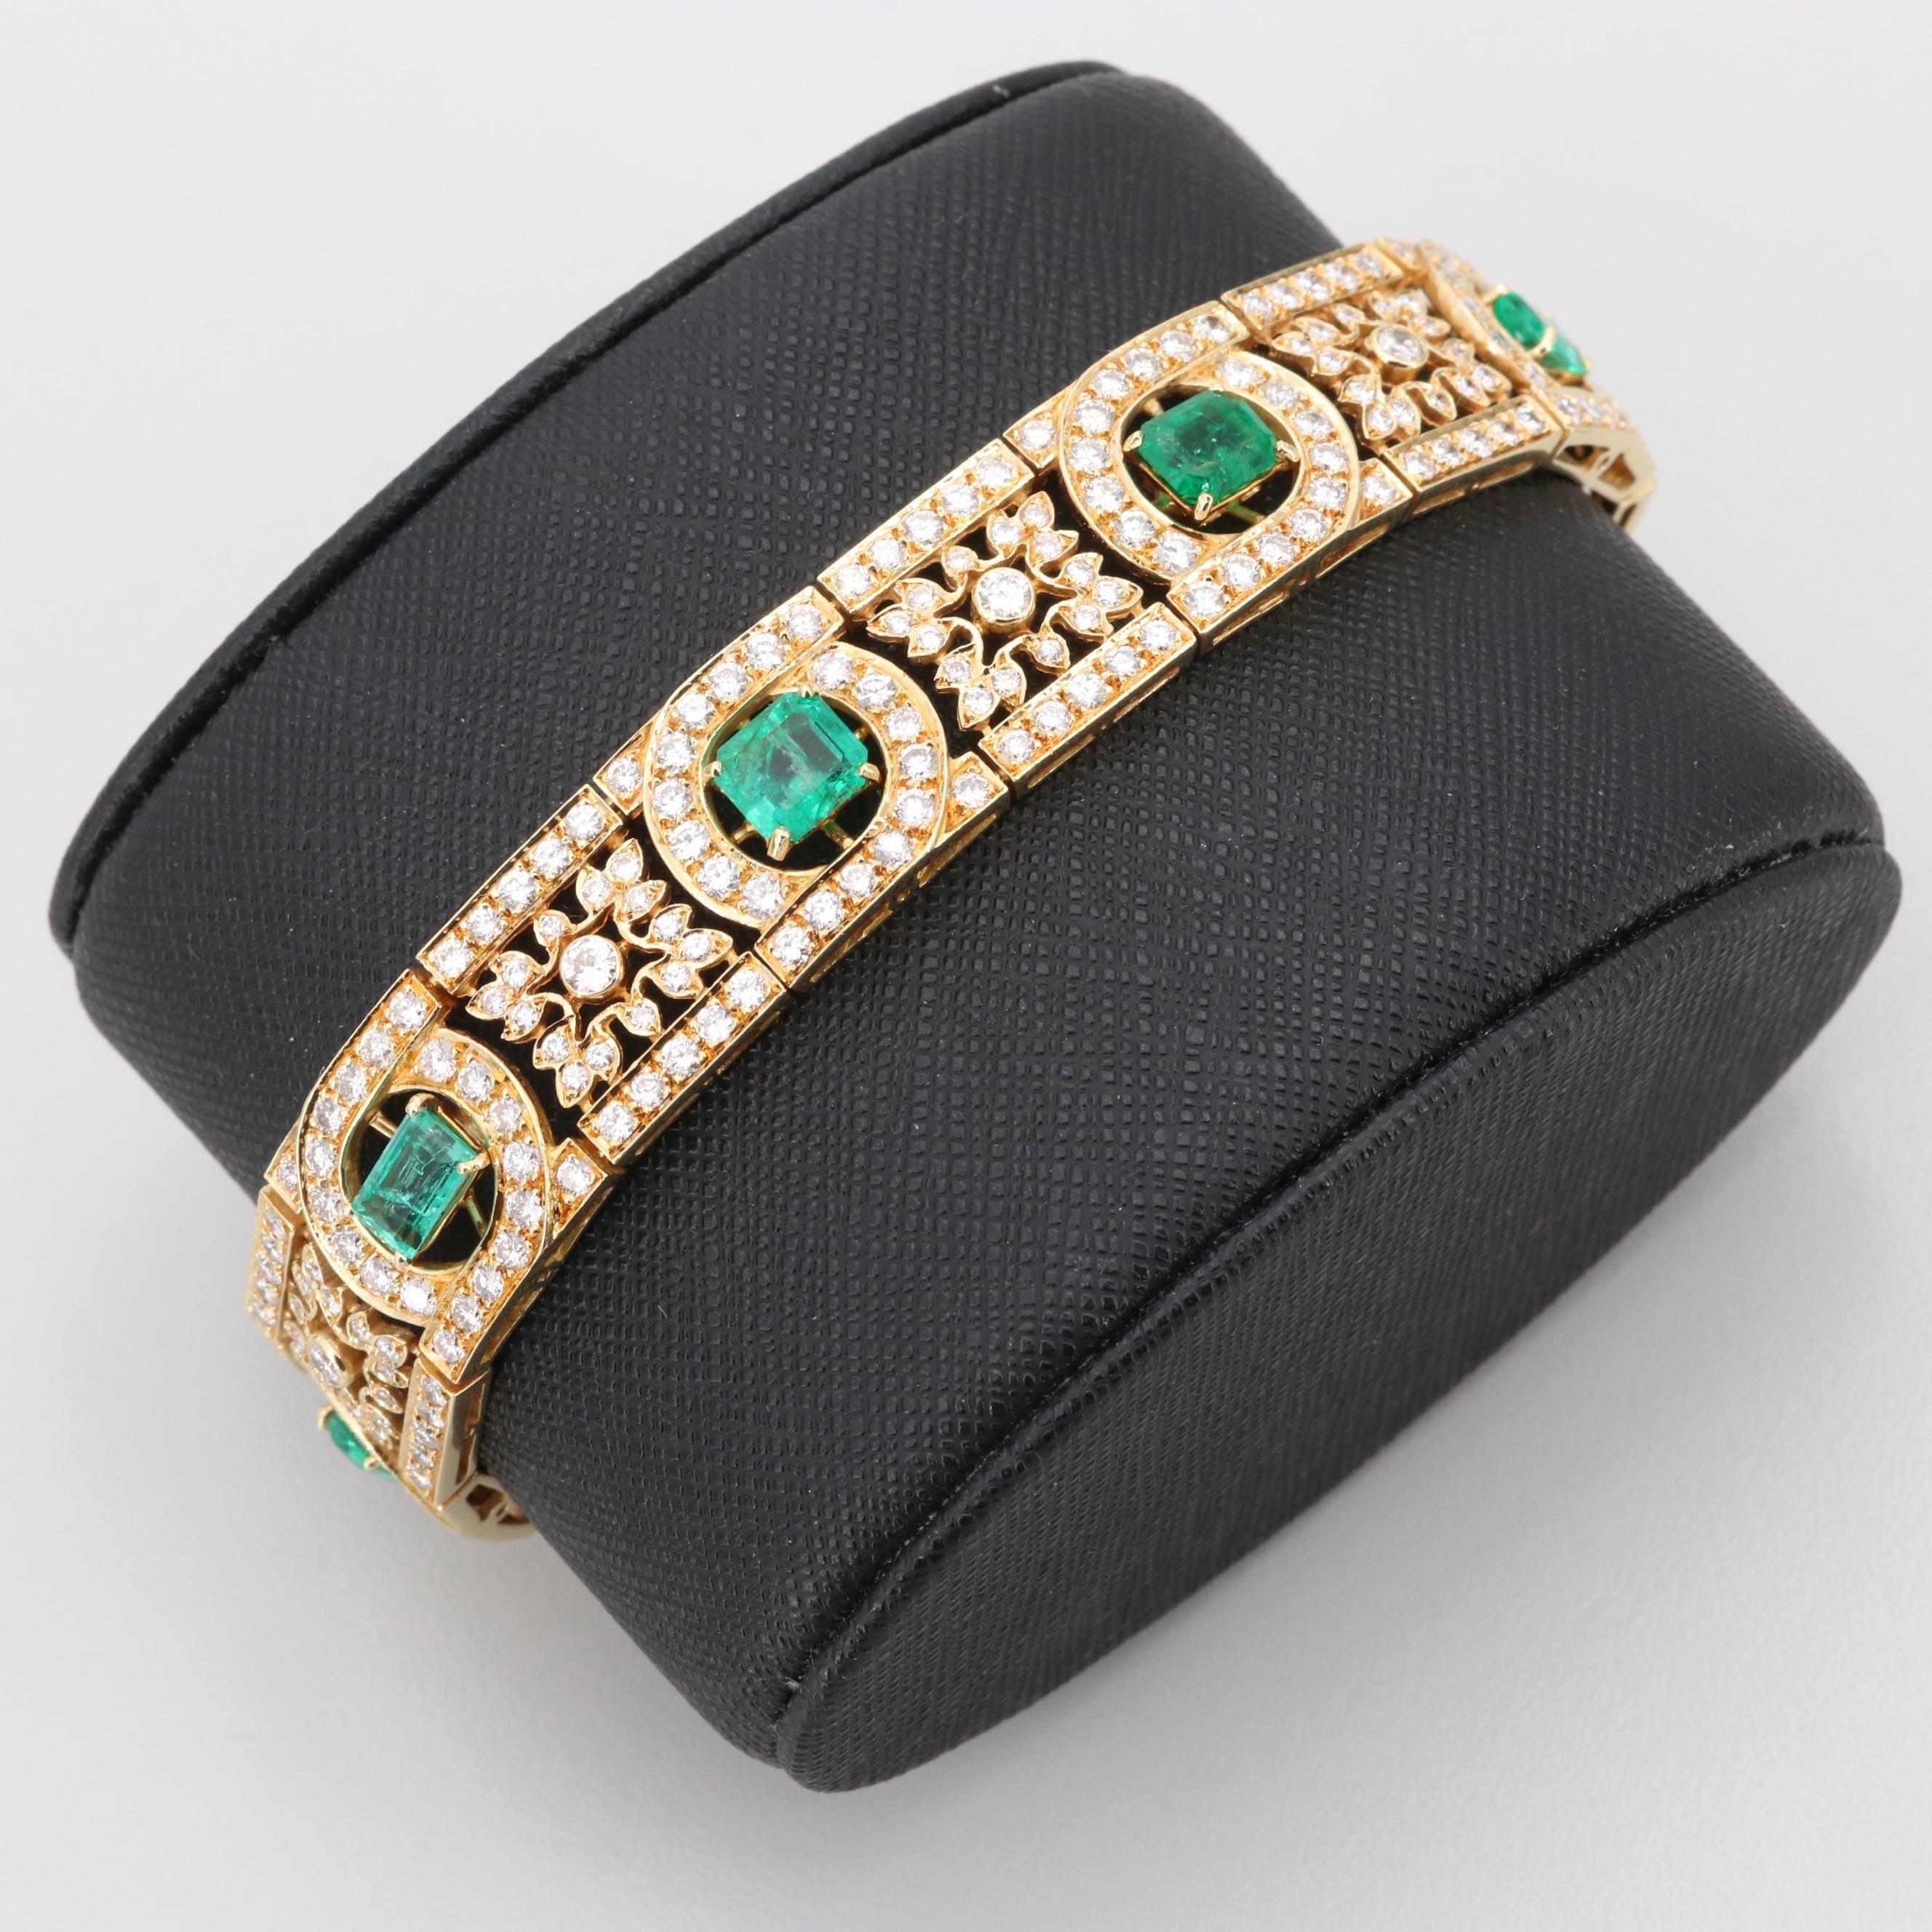 18K Yellow Gold 4.31 CTW Emerald and 7.45 CTW Diamond Linked Bracelet